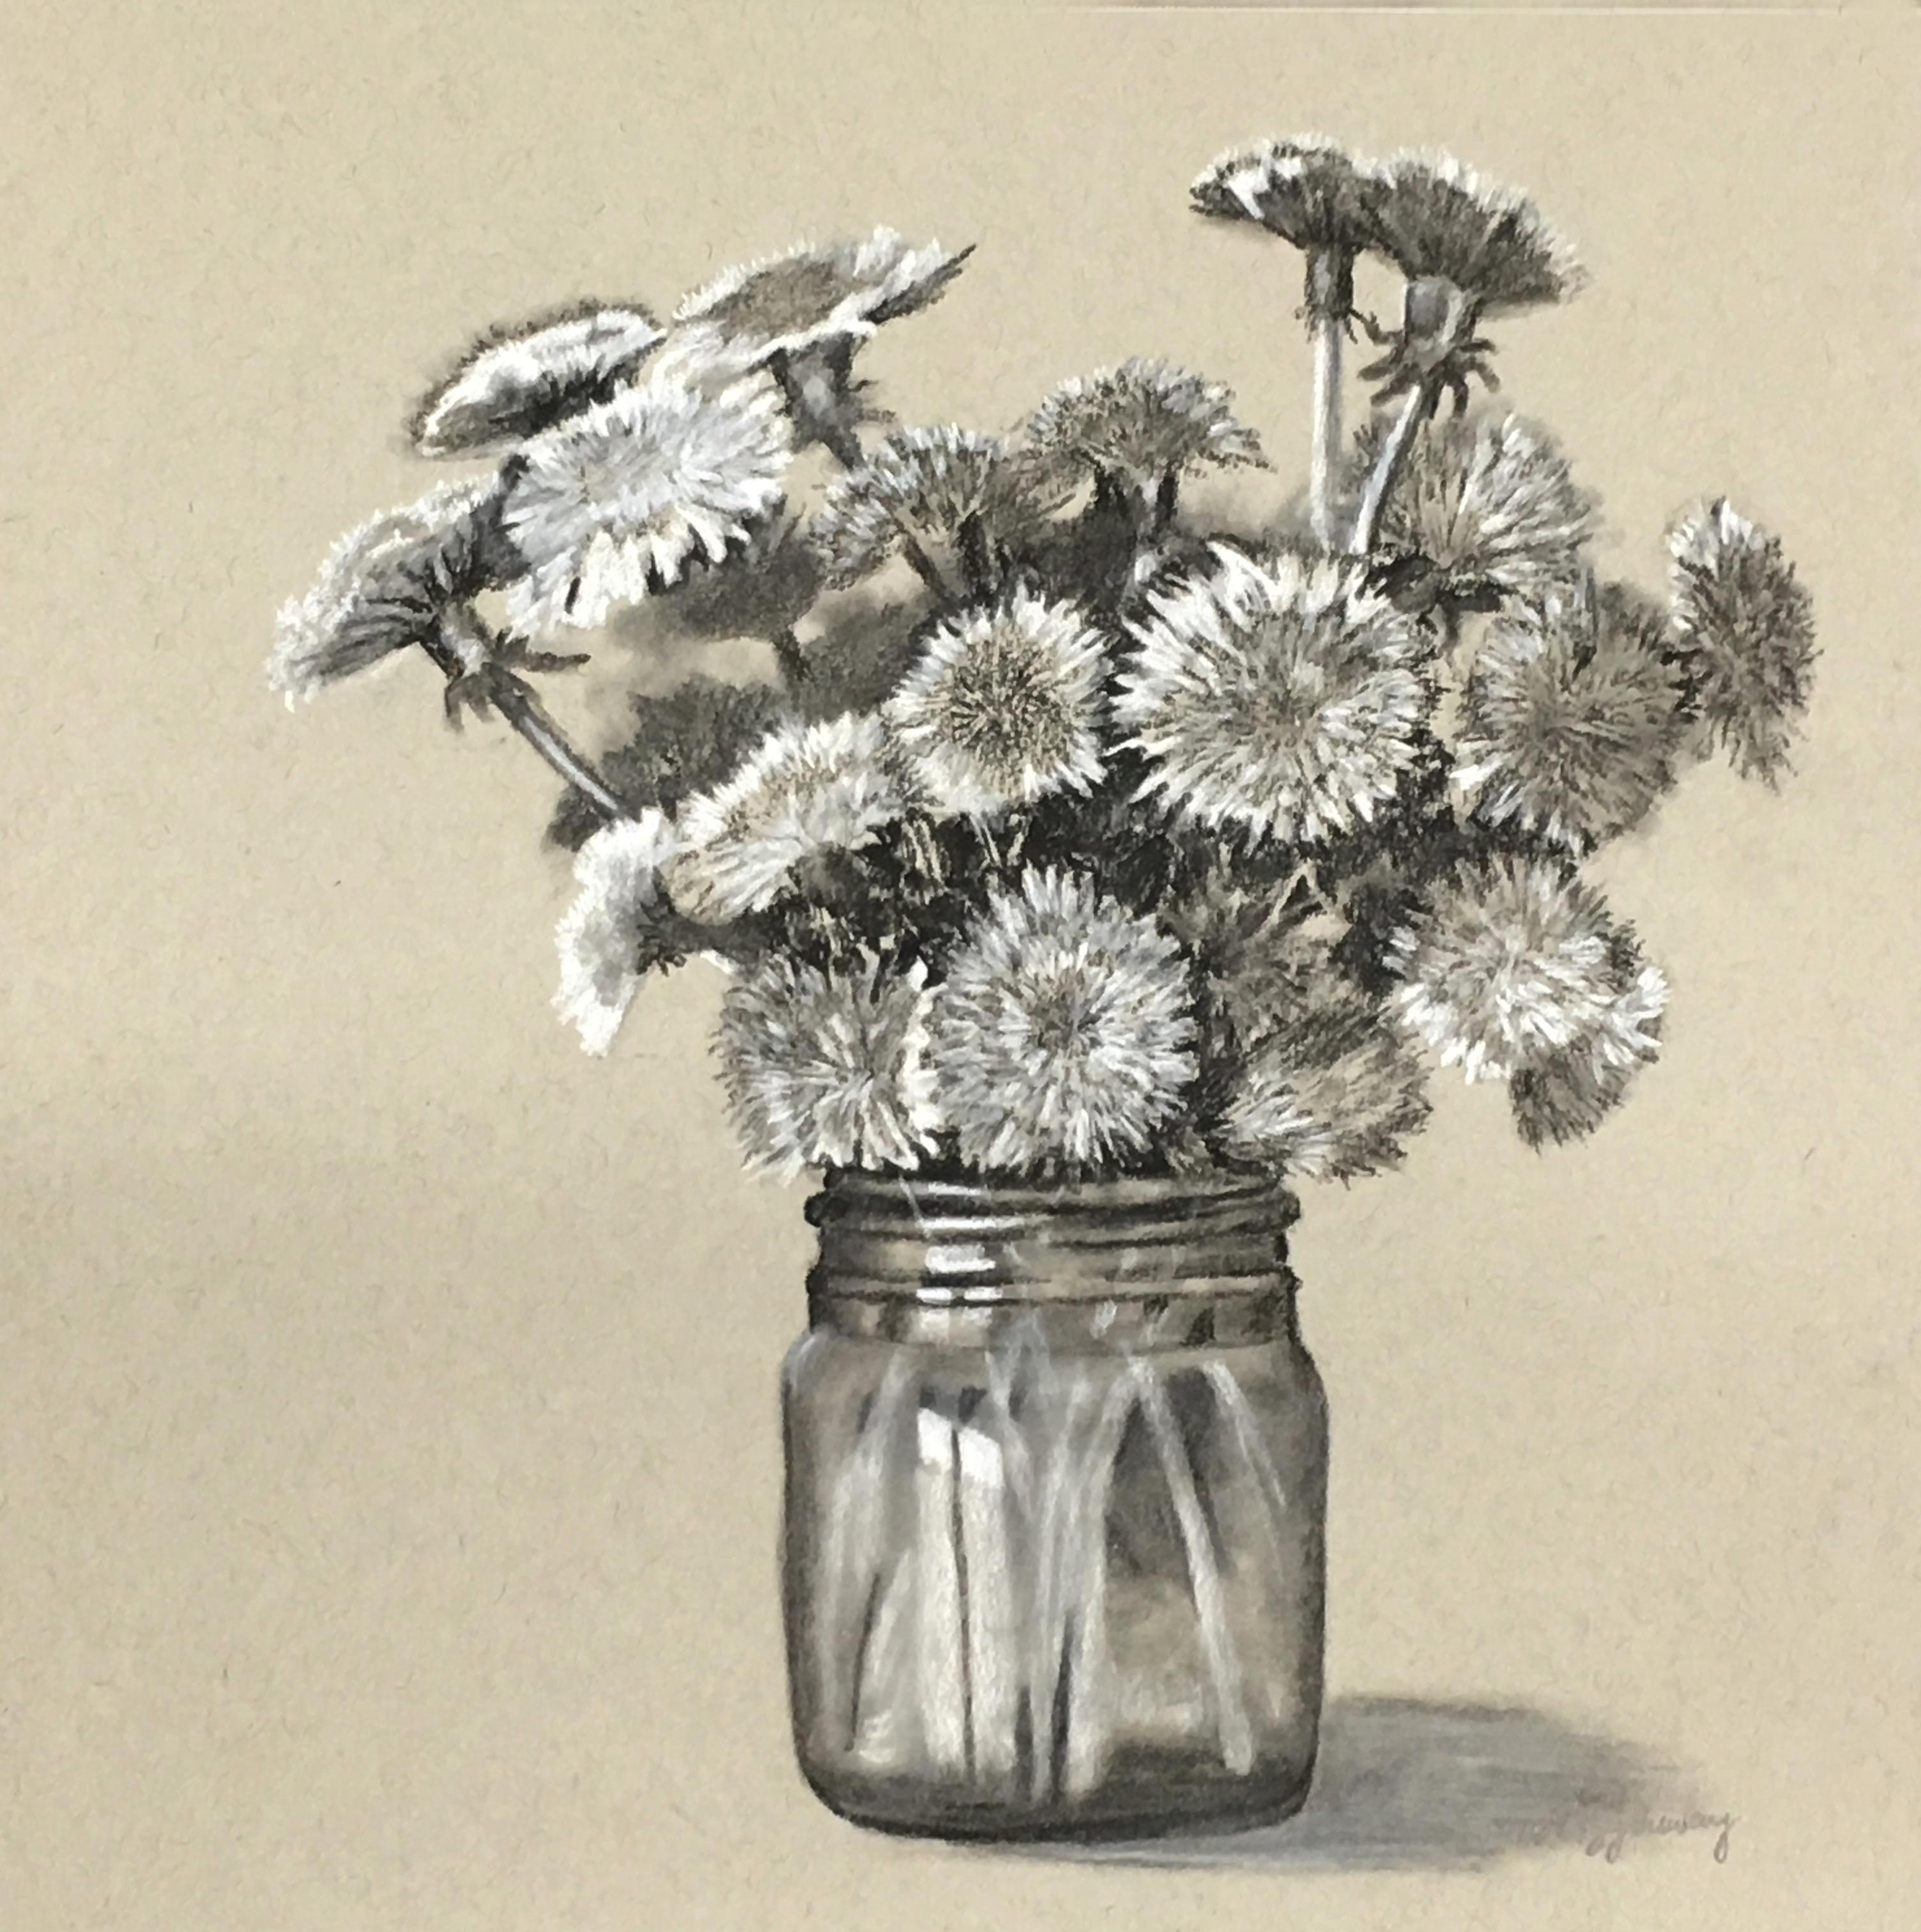 Dandelions in jar